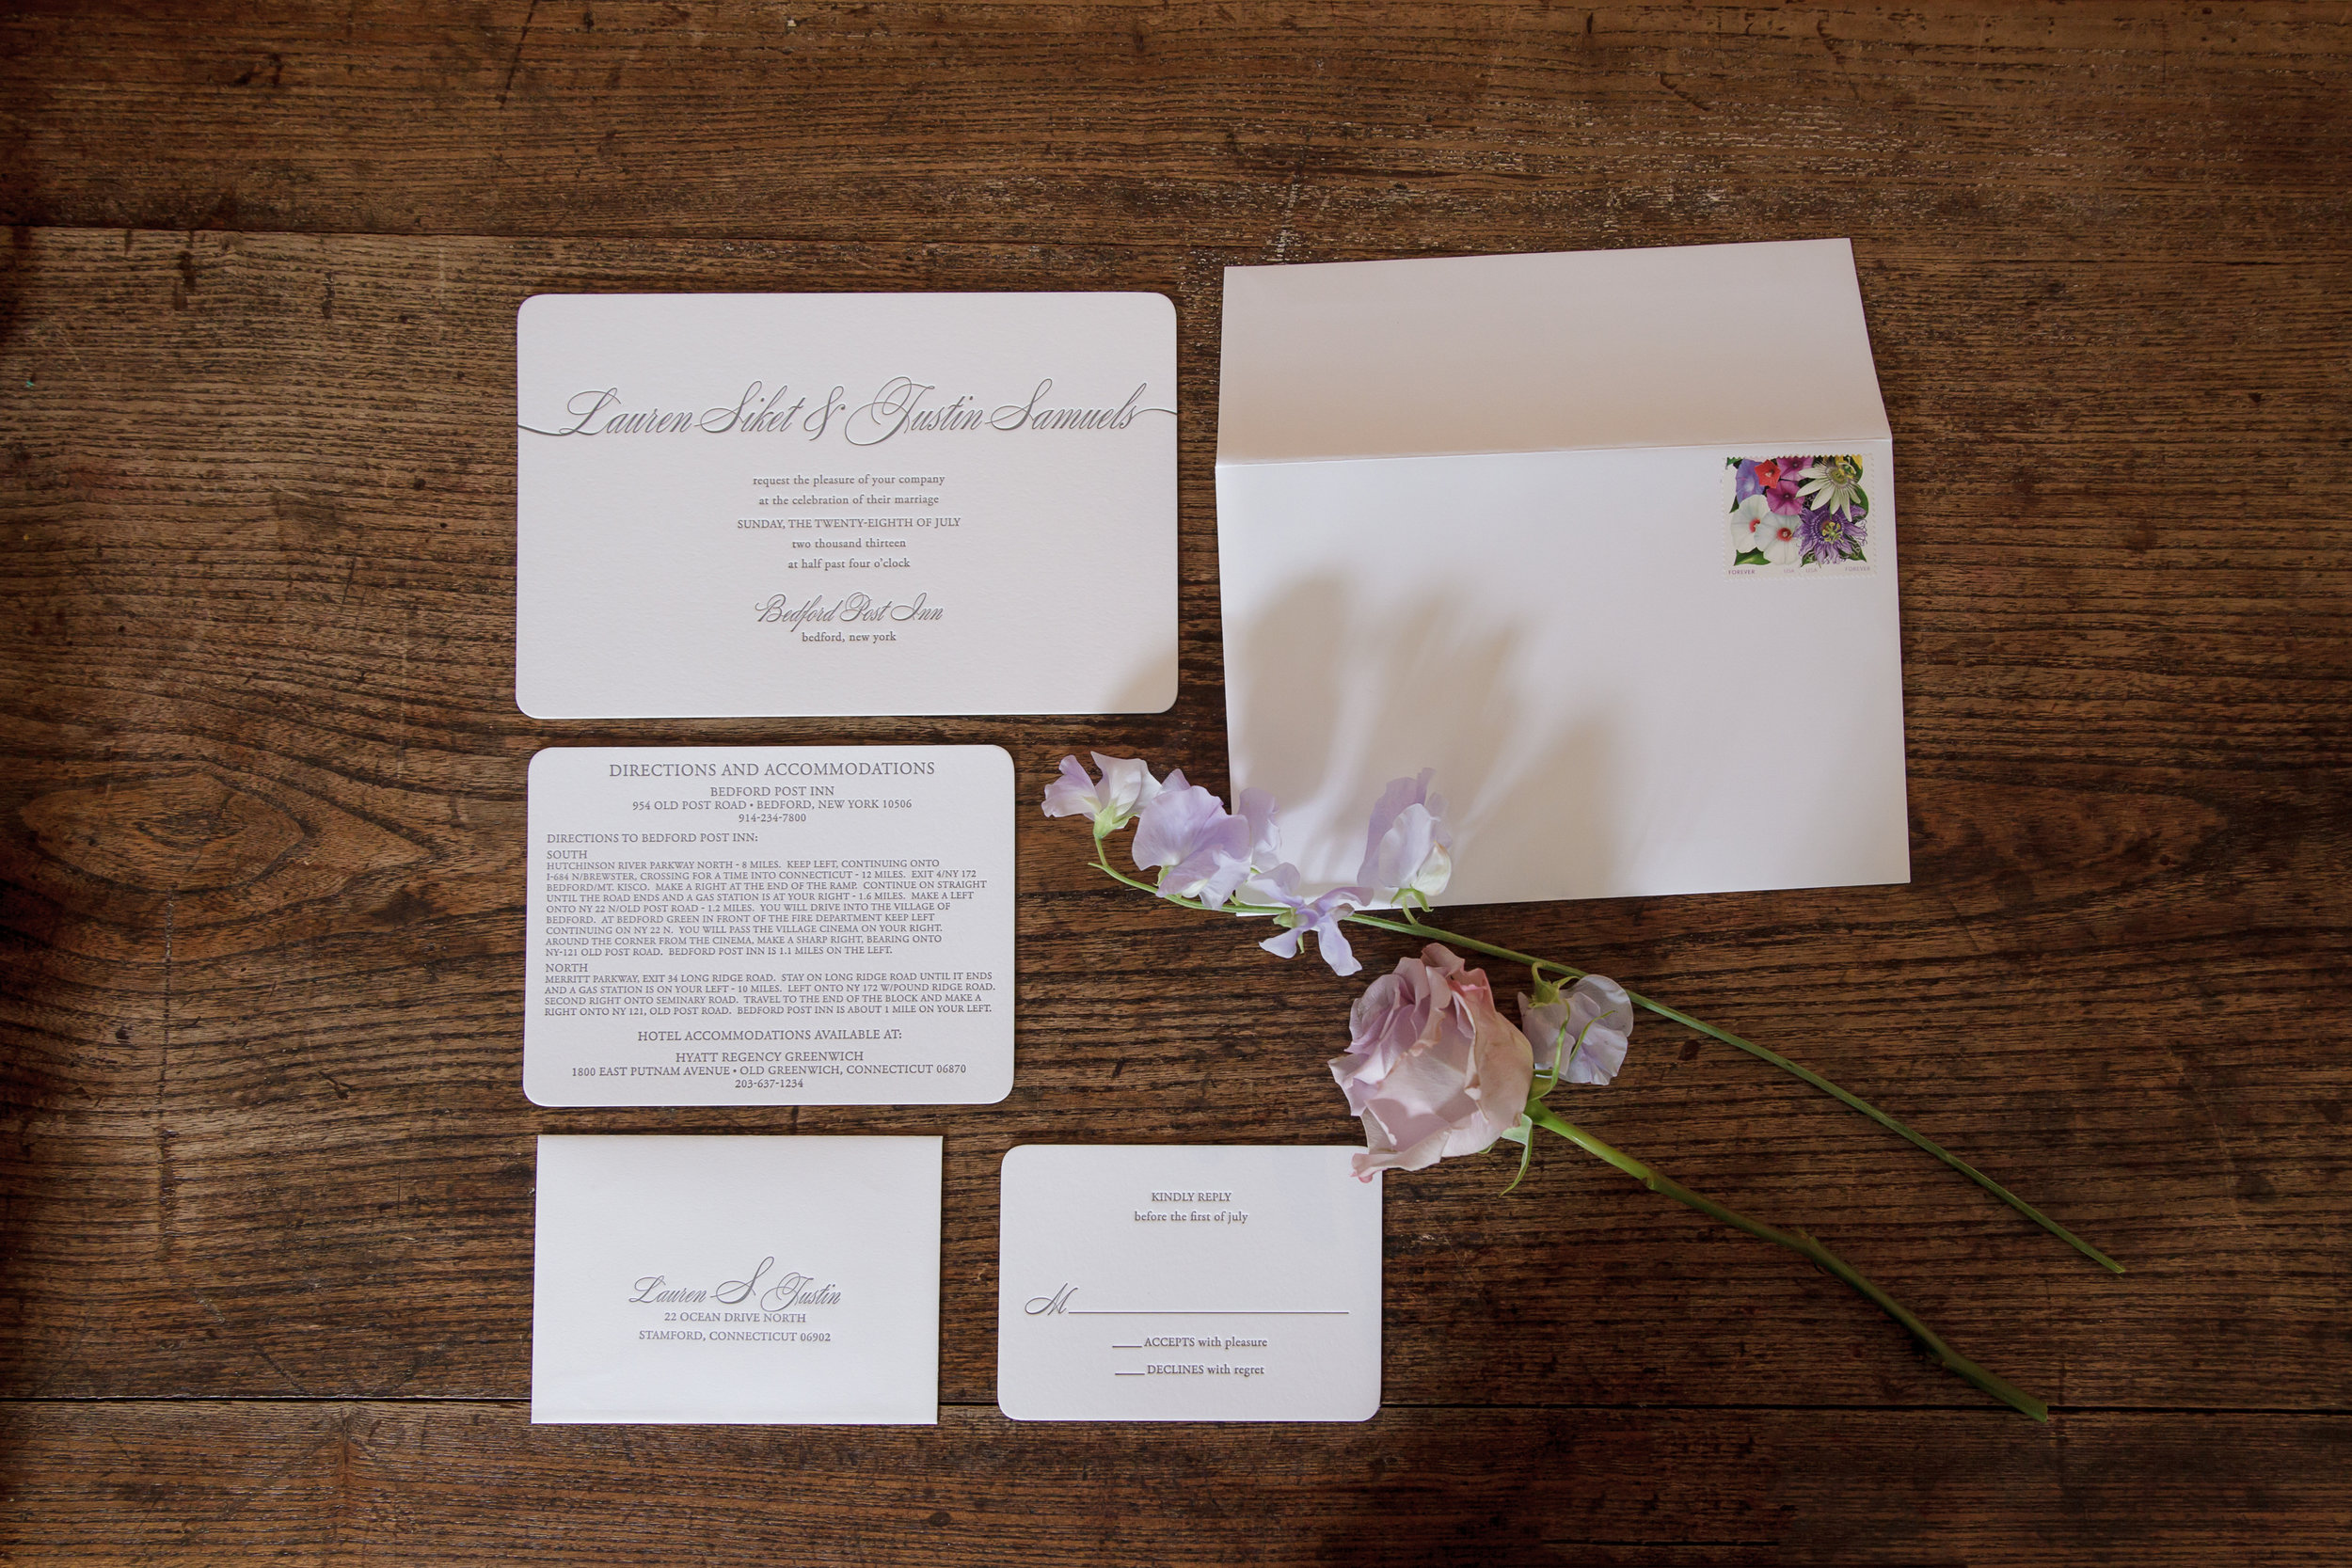 Bedford Post Inn, Westchester Wedding Reception